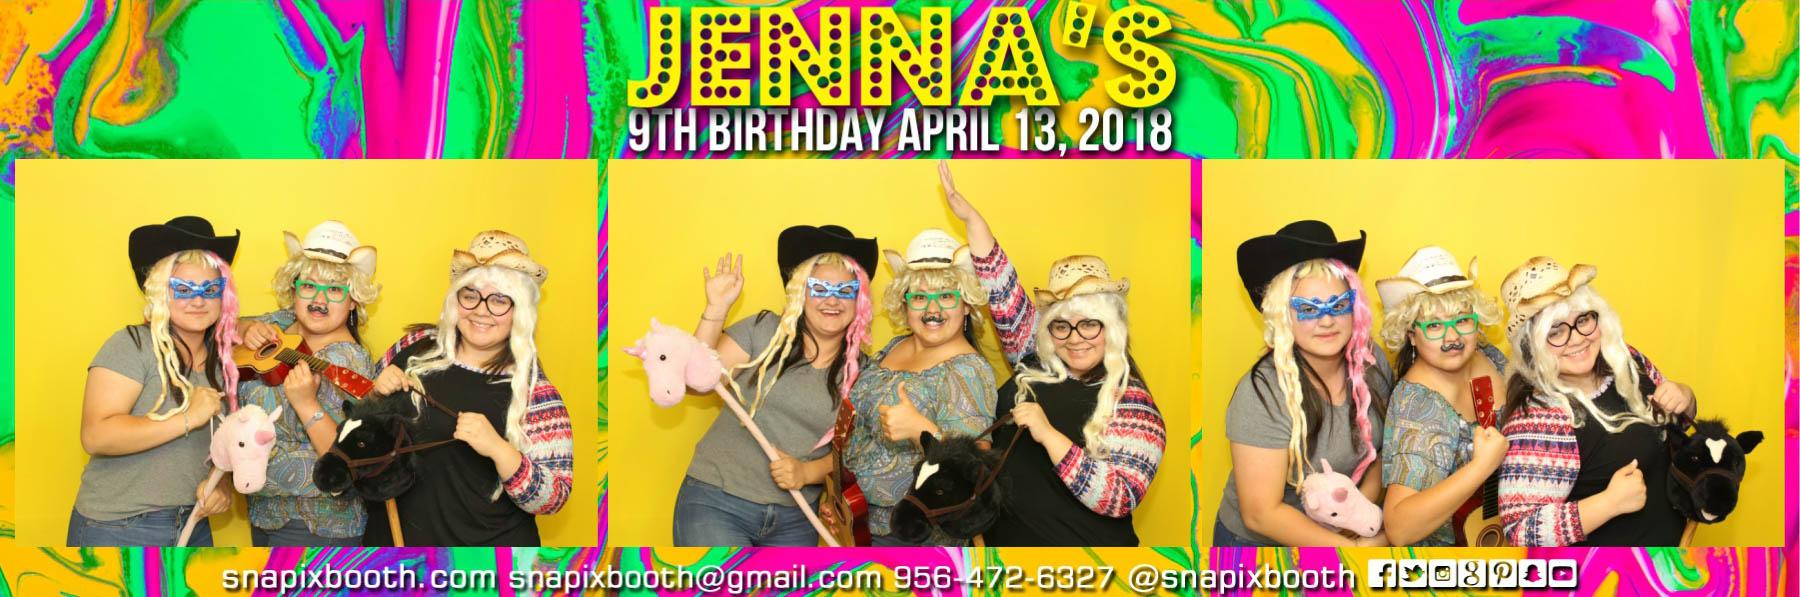 Jenna's 9th Birthday